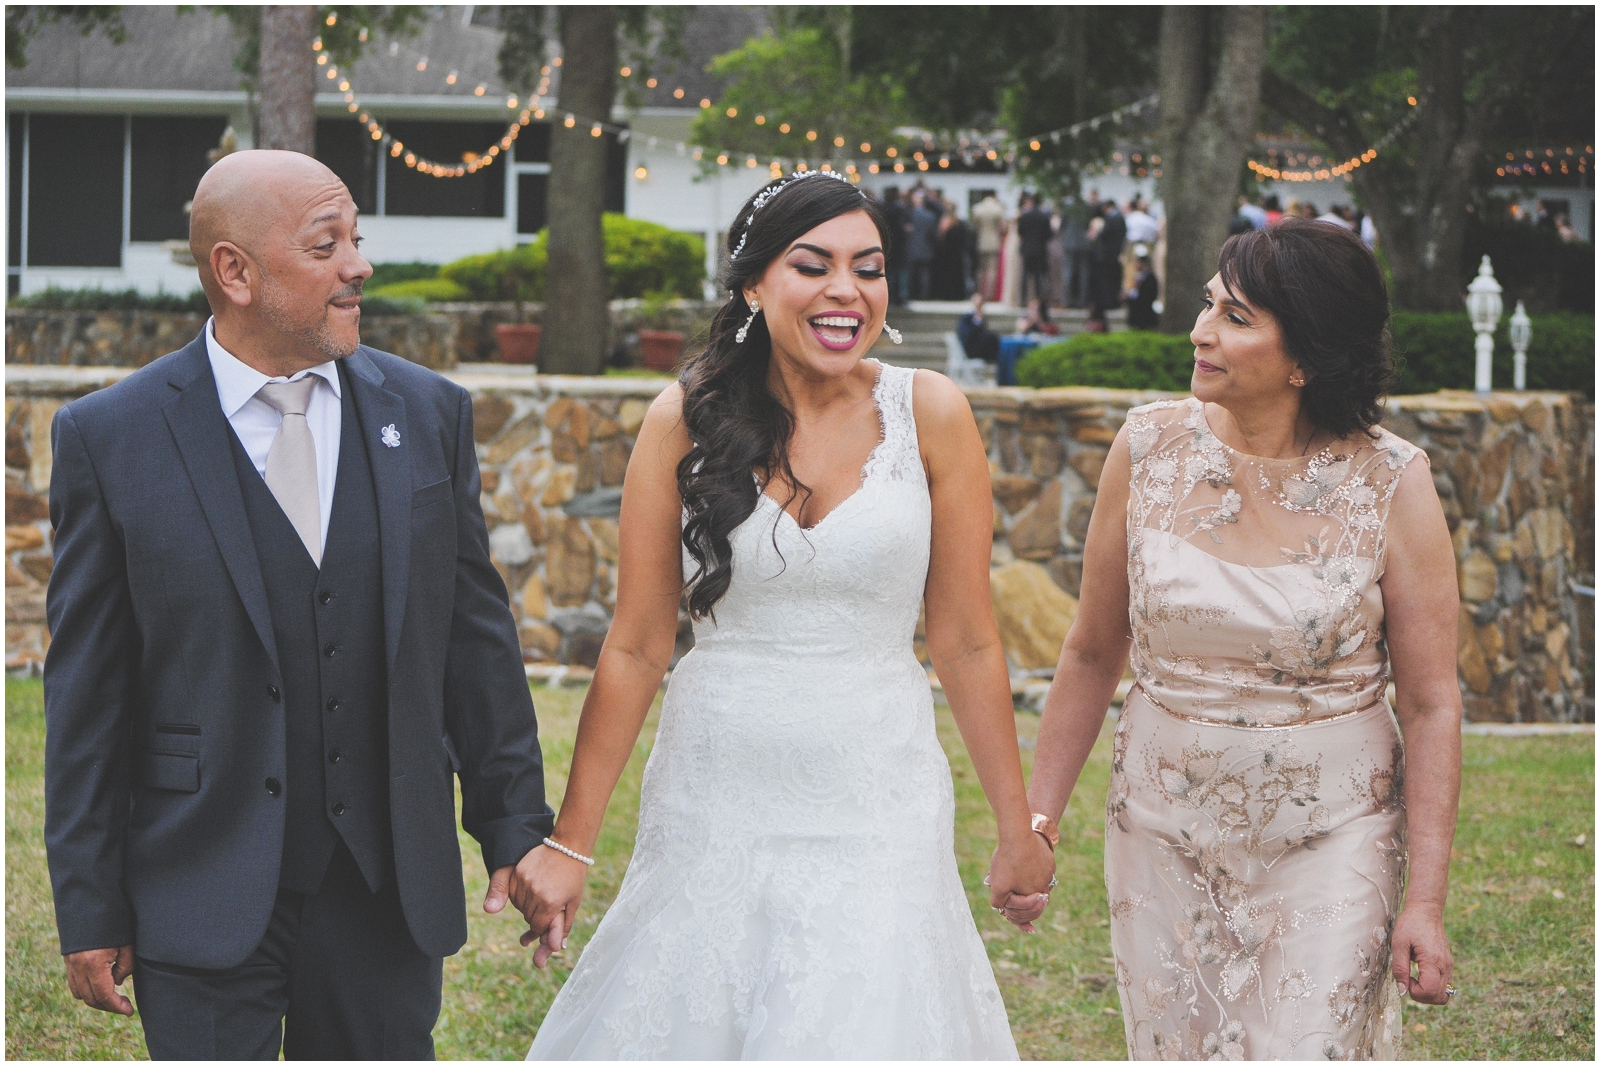 Rustic-Elegant-Wedding-Venue-in-Tampa-Stonebridge-Events_0431.jpg